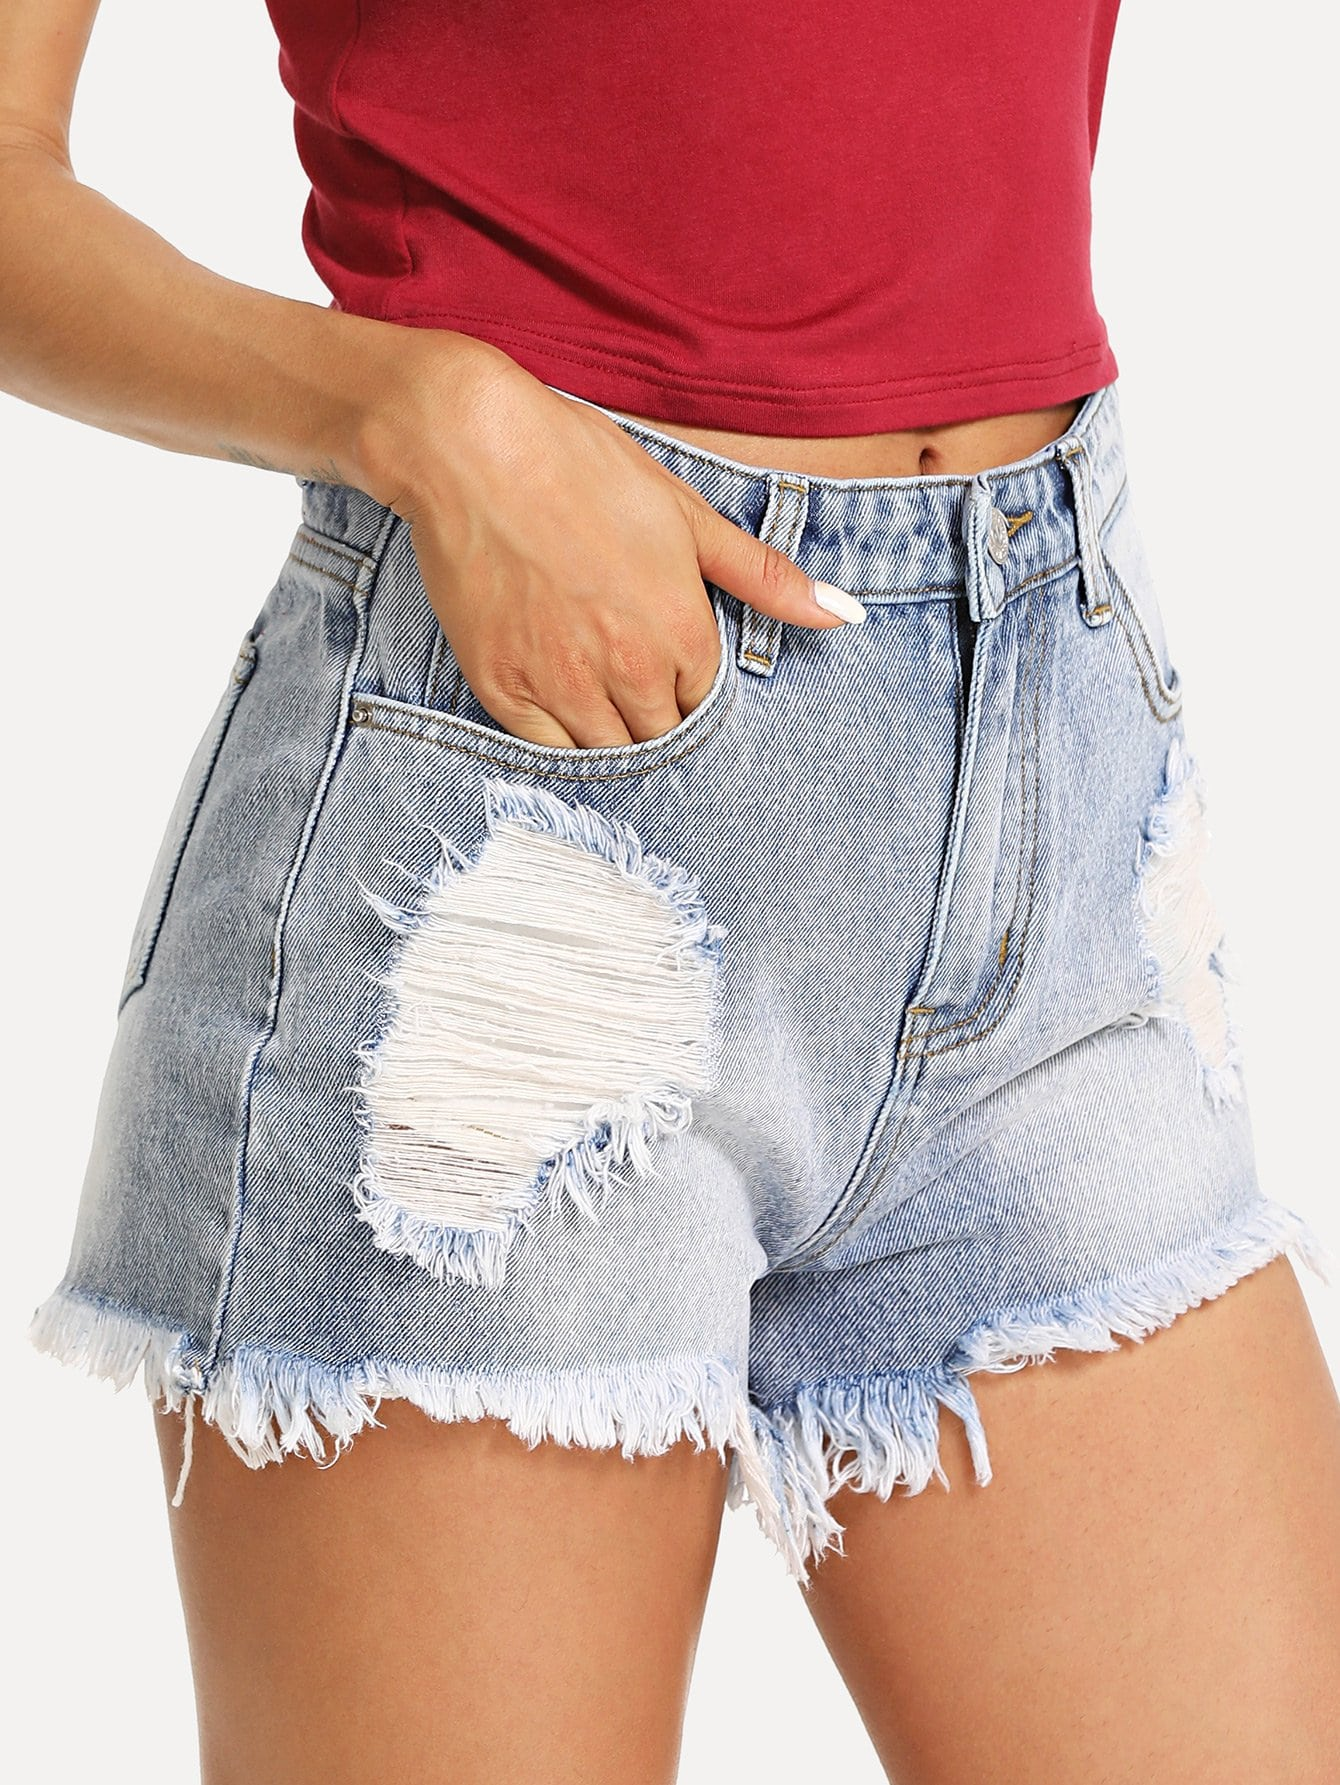 Raw Hem Ripped Denim Shorts chic pocket design ripped hem denim shorts for women